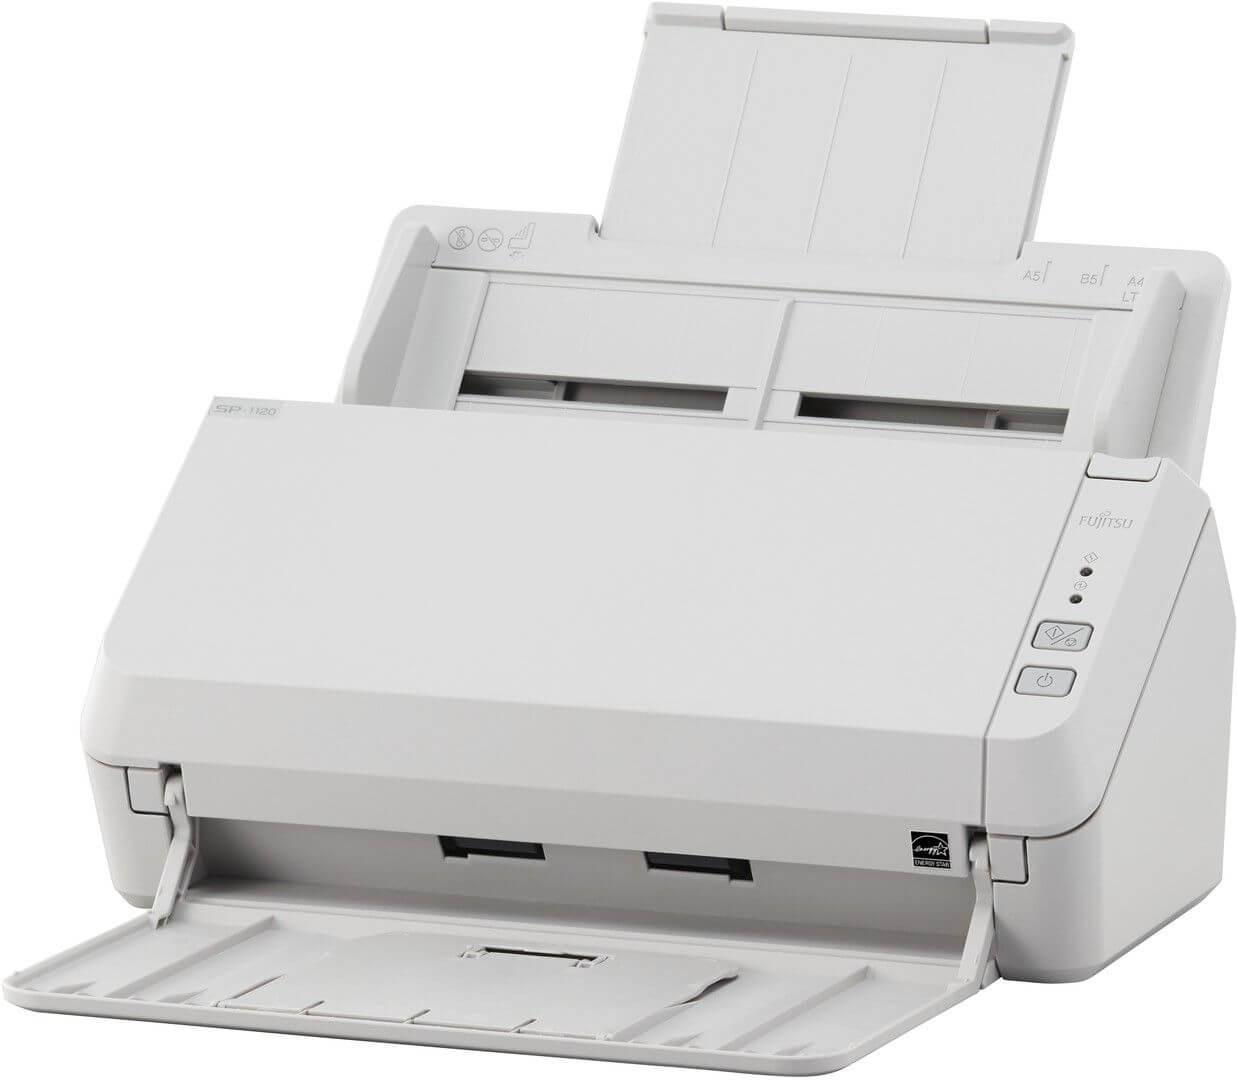 Foto Produto Scanner Fujitsu SP-1120, 20ppm, Duplex (Frente e Verso)